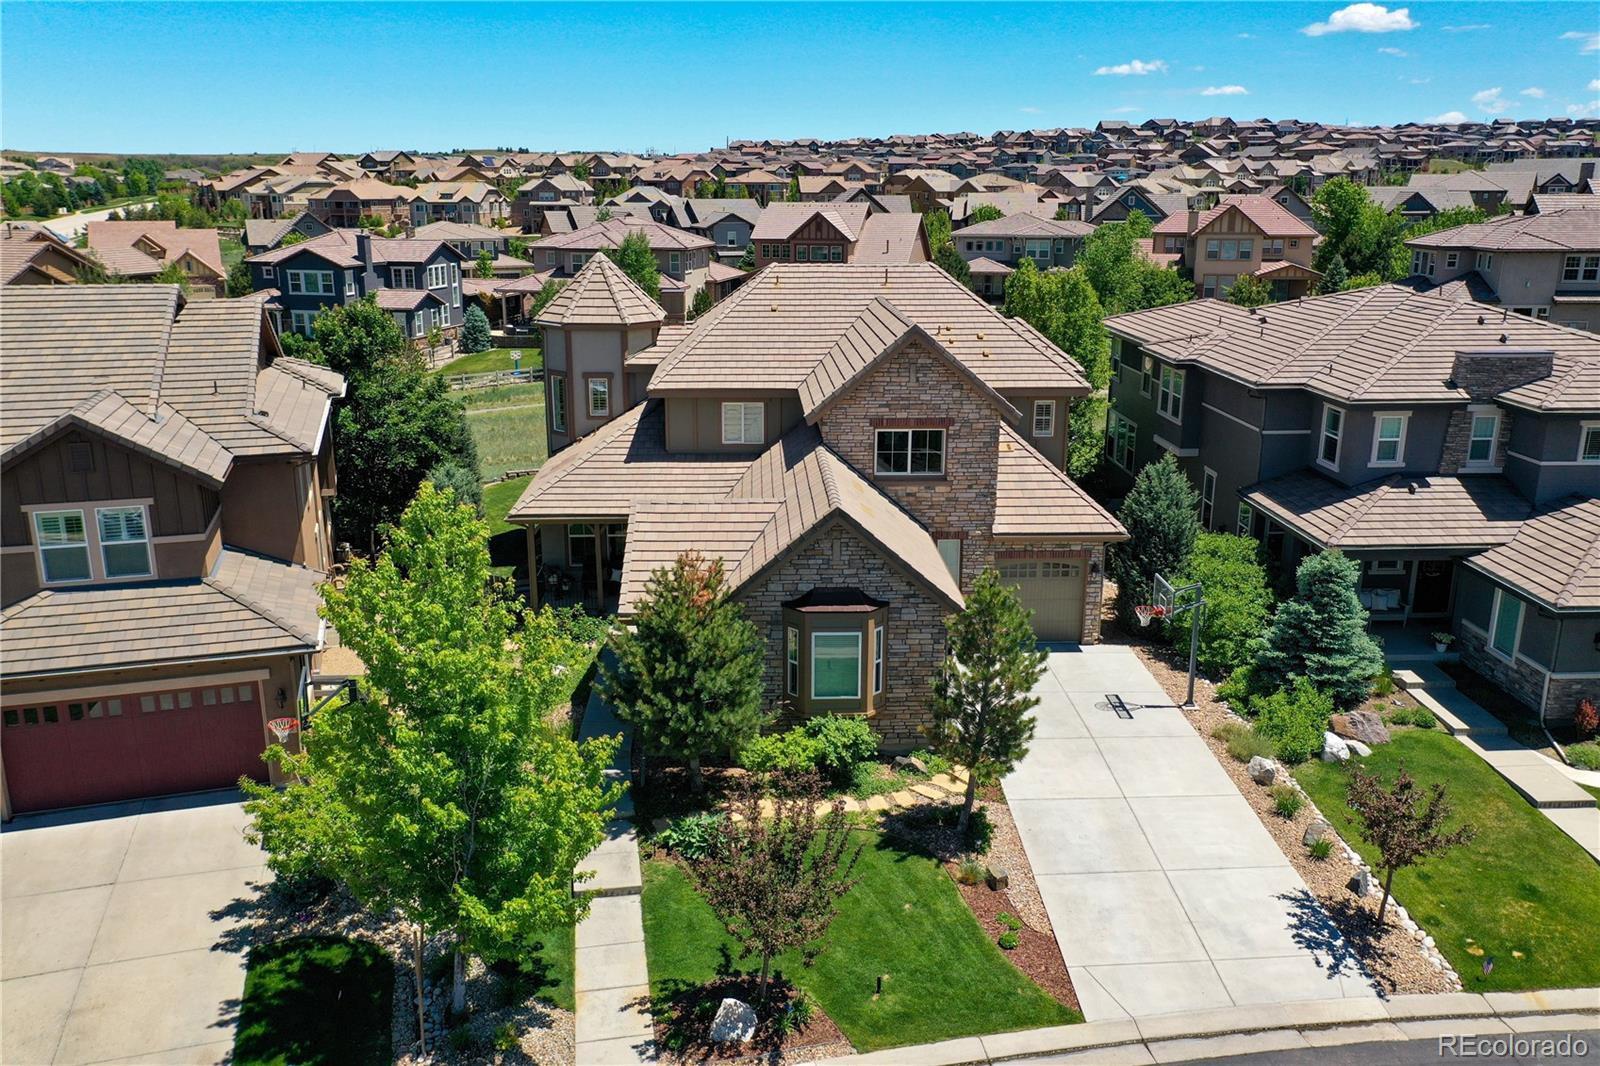 10474 Marigold Court, Highlands Ranch, CO 80126 - Highlands Ranch, CO real estate listing